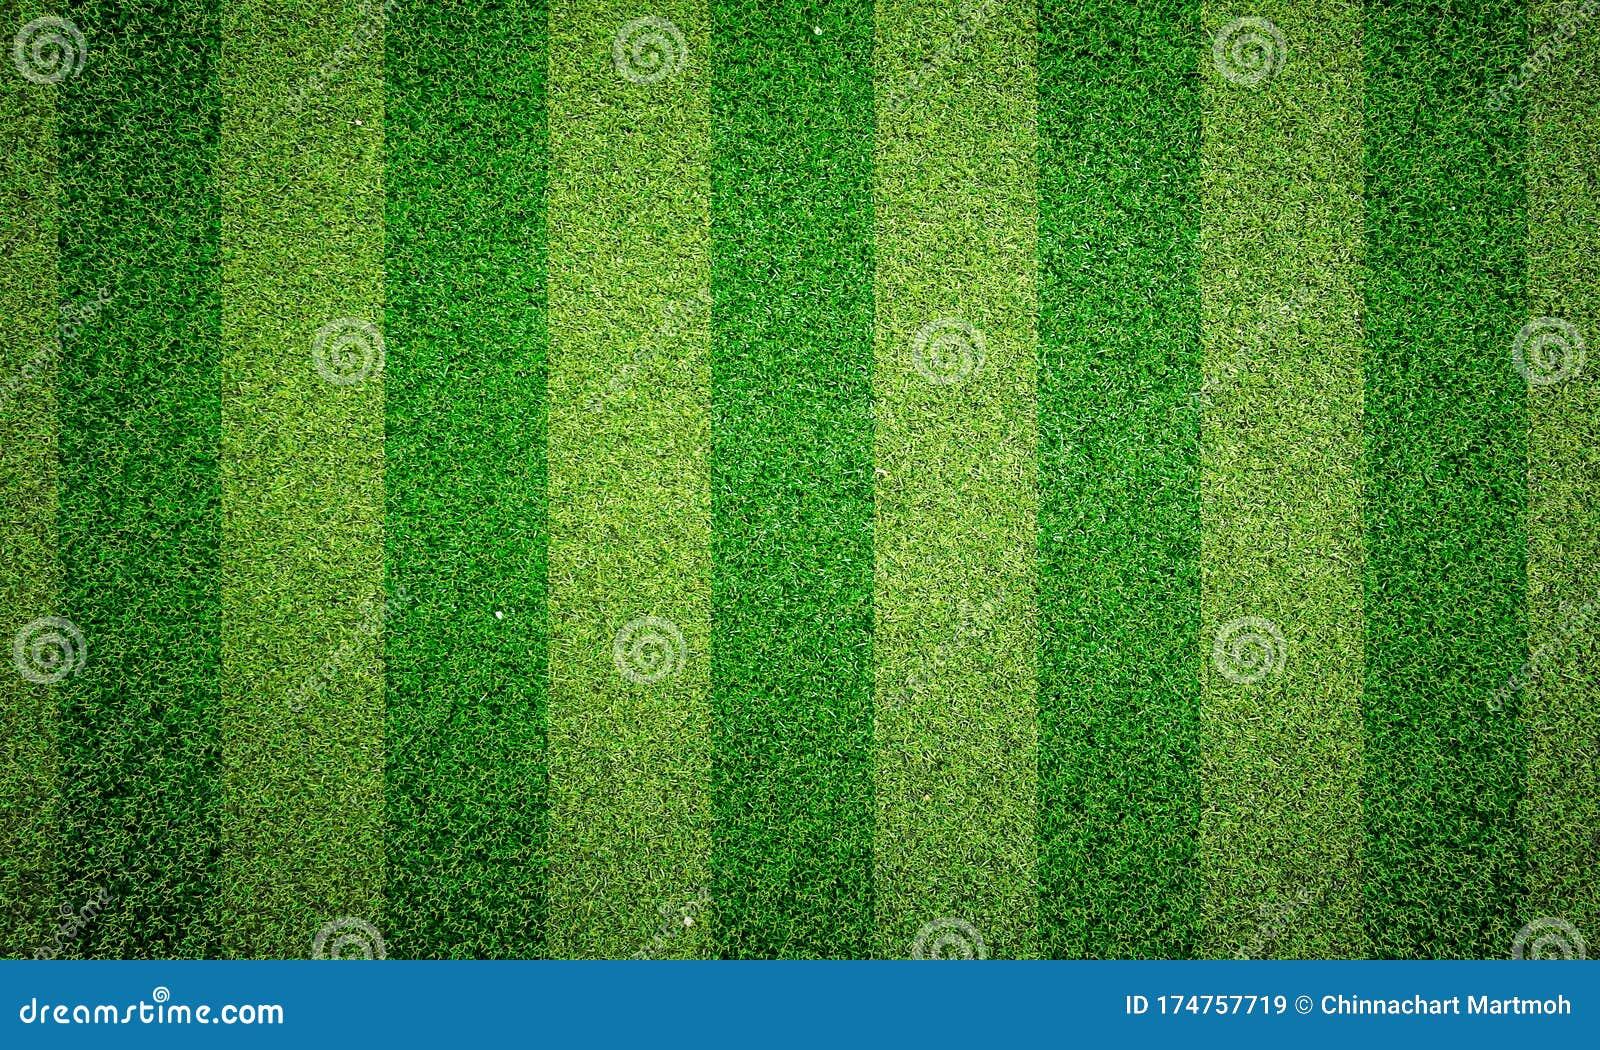 Green Grass Texture Background Green Lawn Backyard For Wallpaper Grass Texture Desktop Picture Park Lawn Texture 3d Stock Image Image Of Environment Ground 174757719